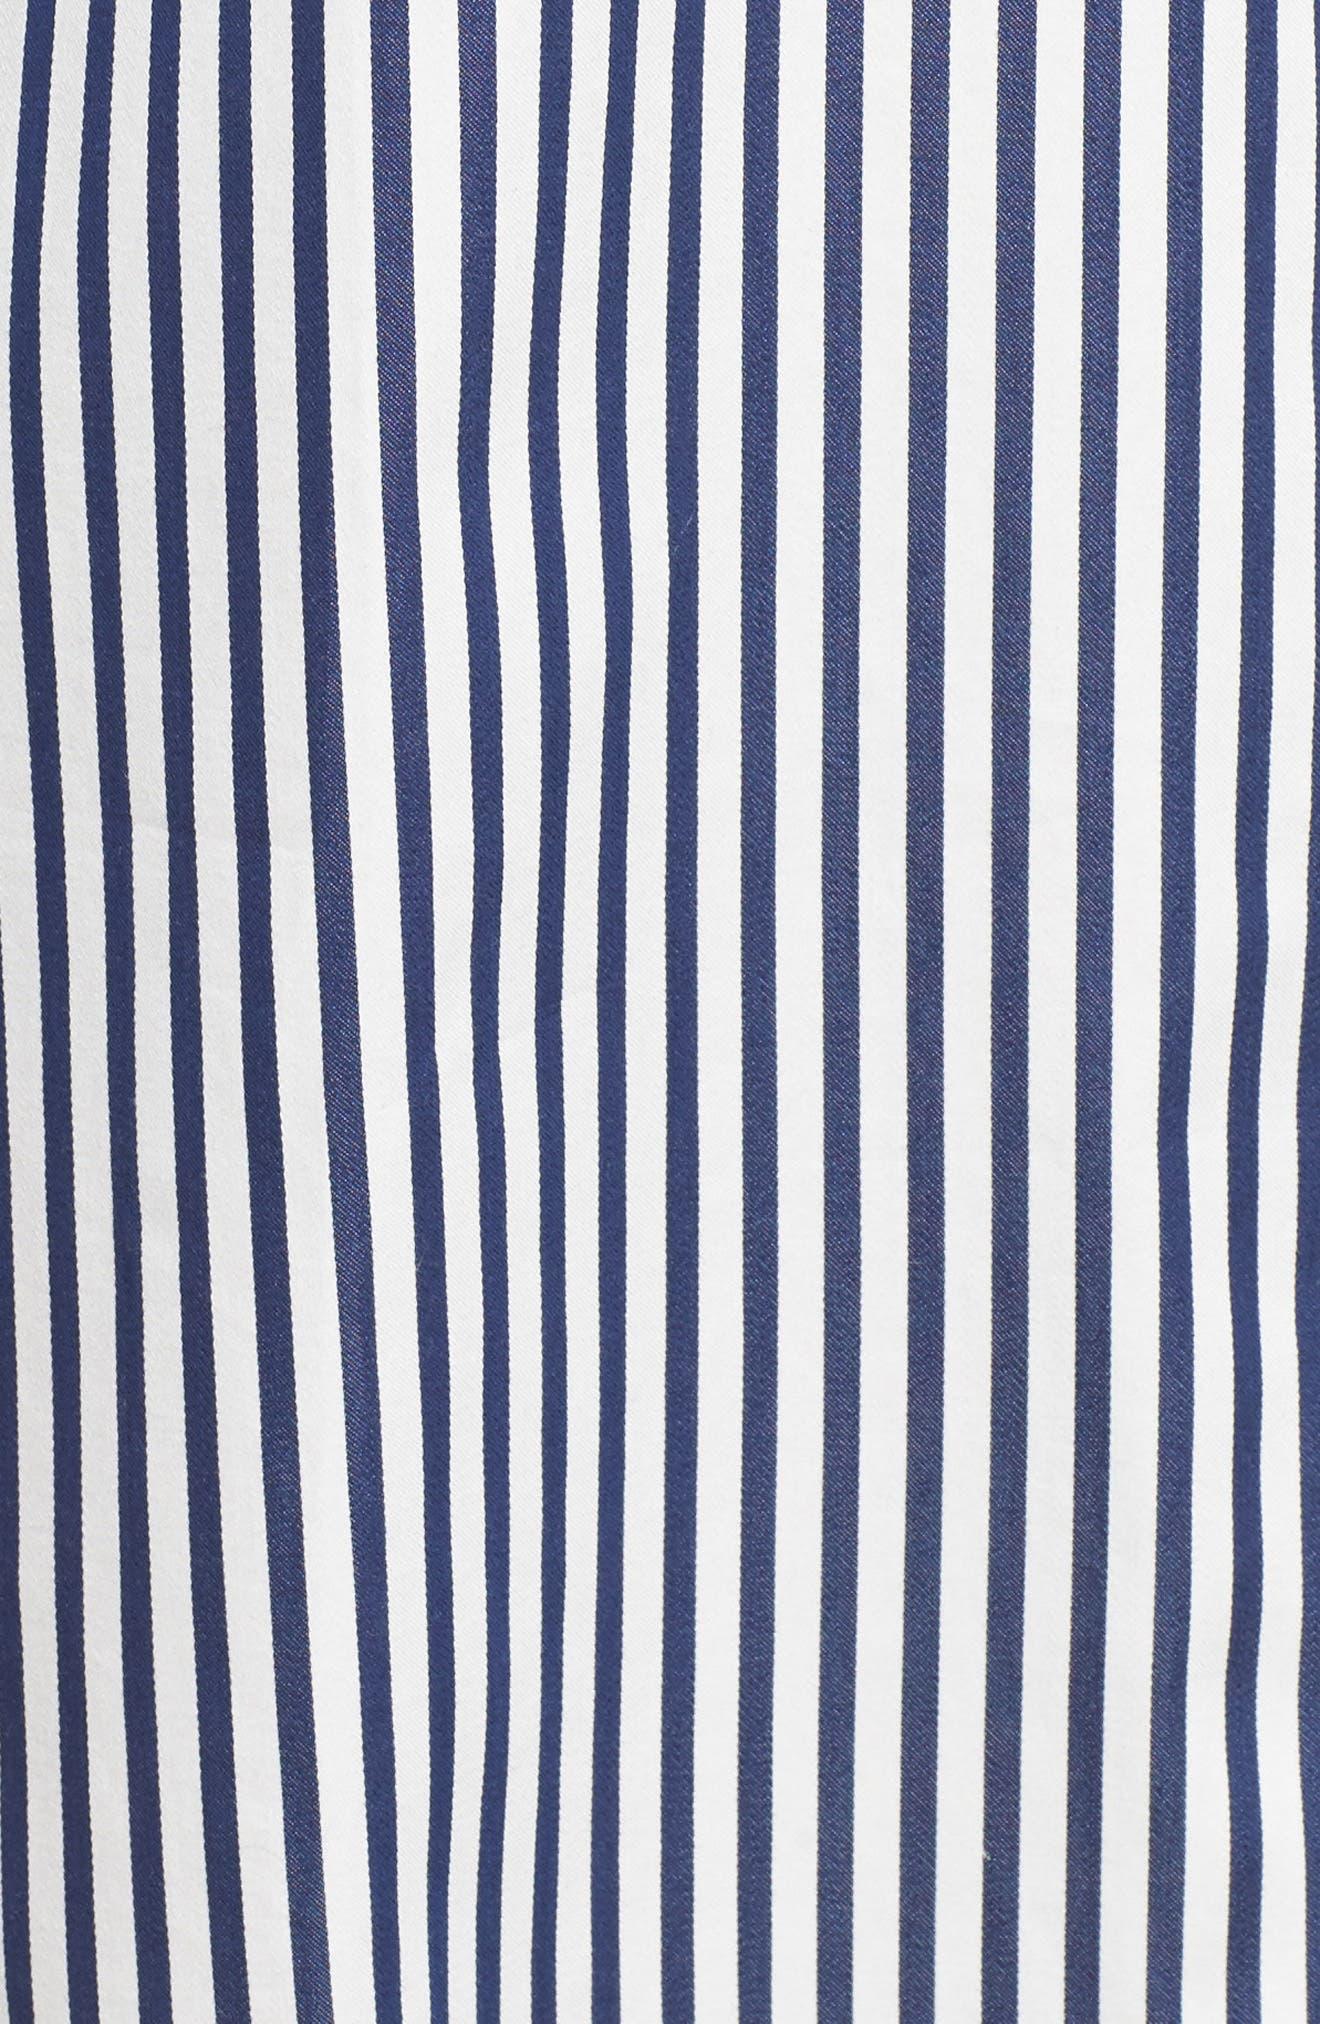 stripe sleep shirt,                             Alternate thumbnail 5, color,                             414